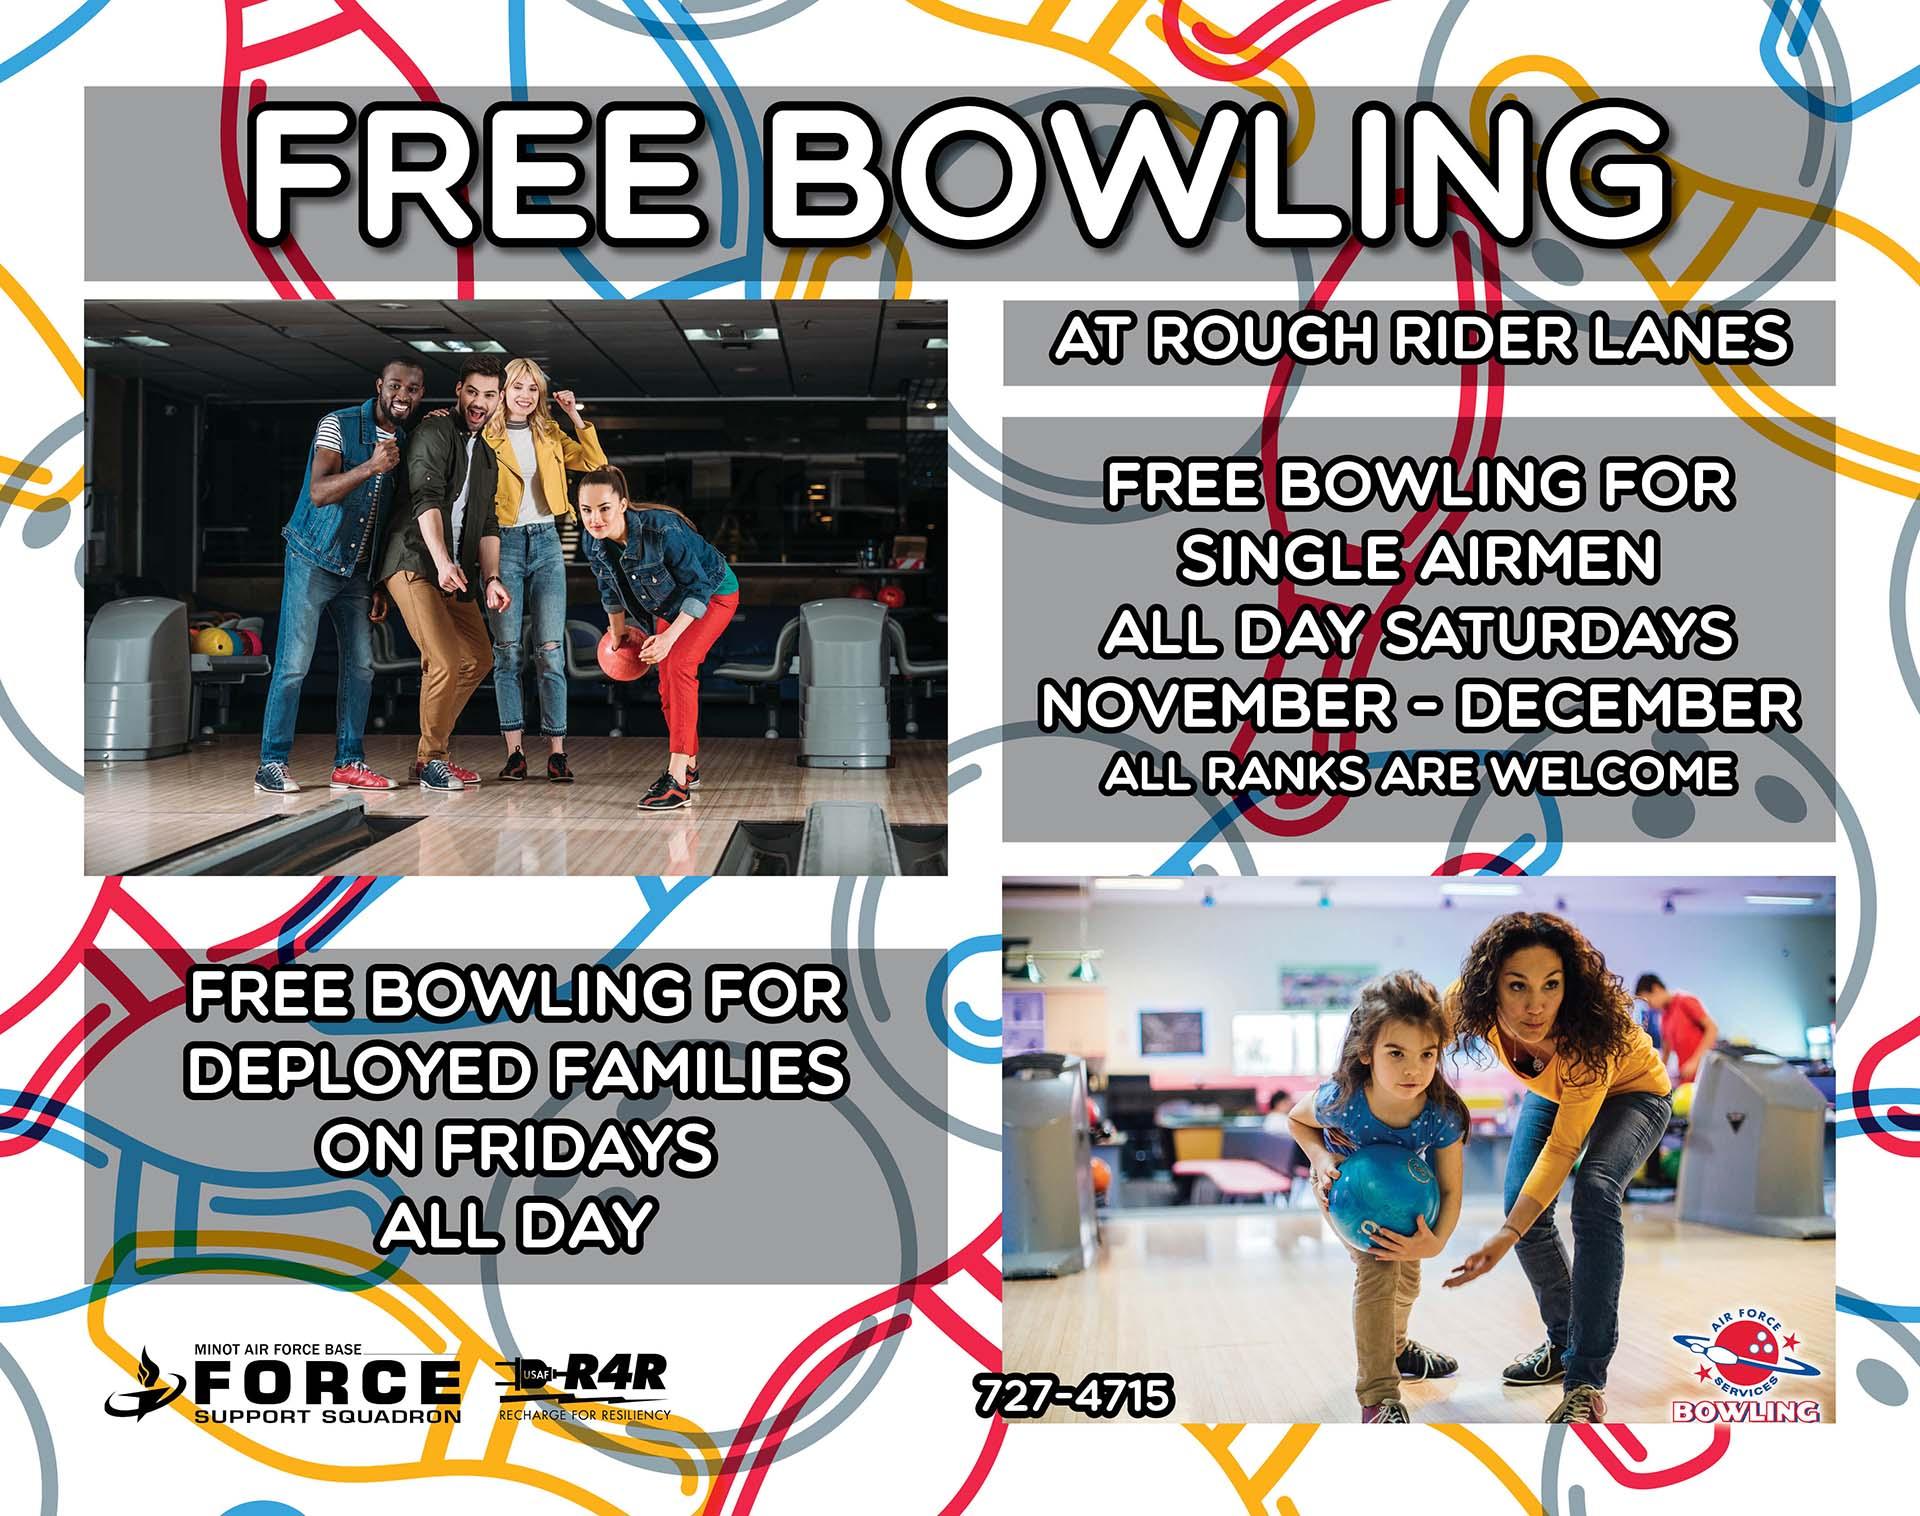 12.31 Free Bowling